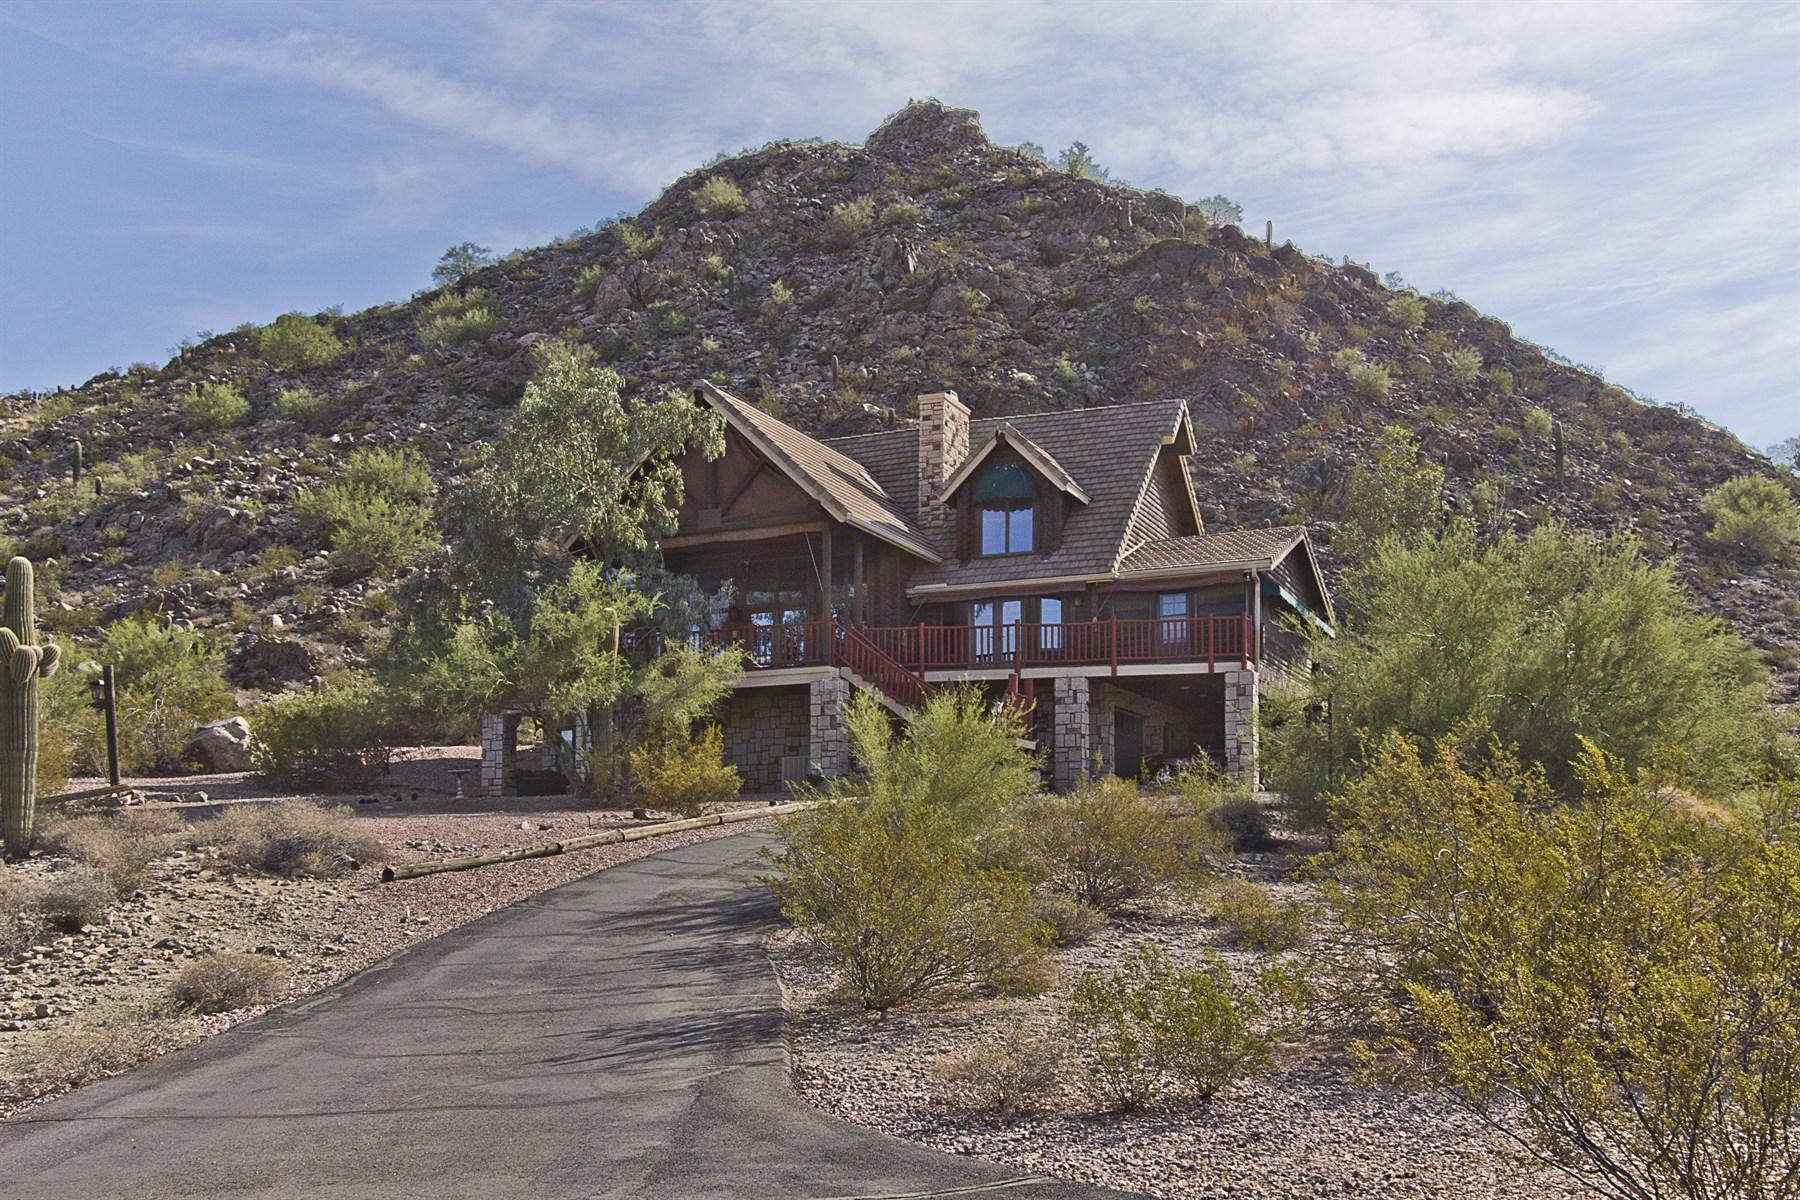 Casa para uma família para Venda às Stunning log home estate on 10 acres nestled into the beautiful Santan Mountains 31545 N Pamela Dr Queen Creek, Arizona 85142 Estados Unidos